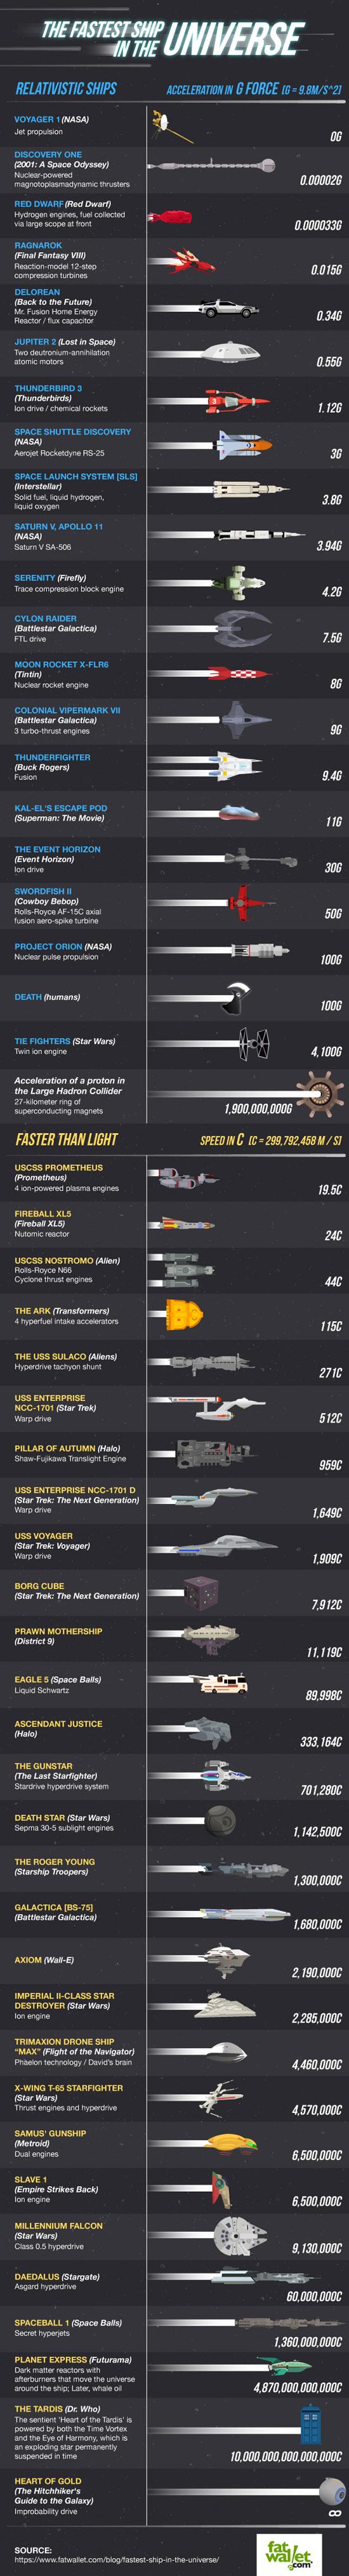 fastest-ships